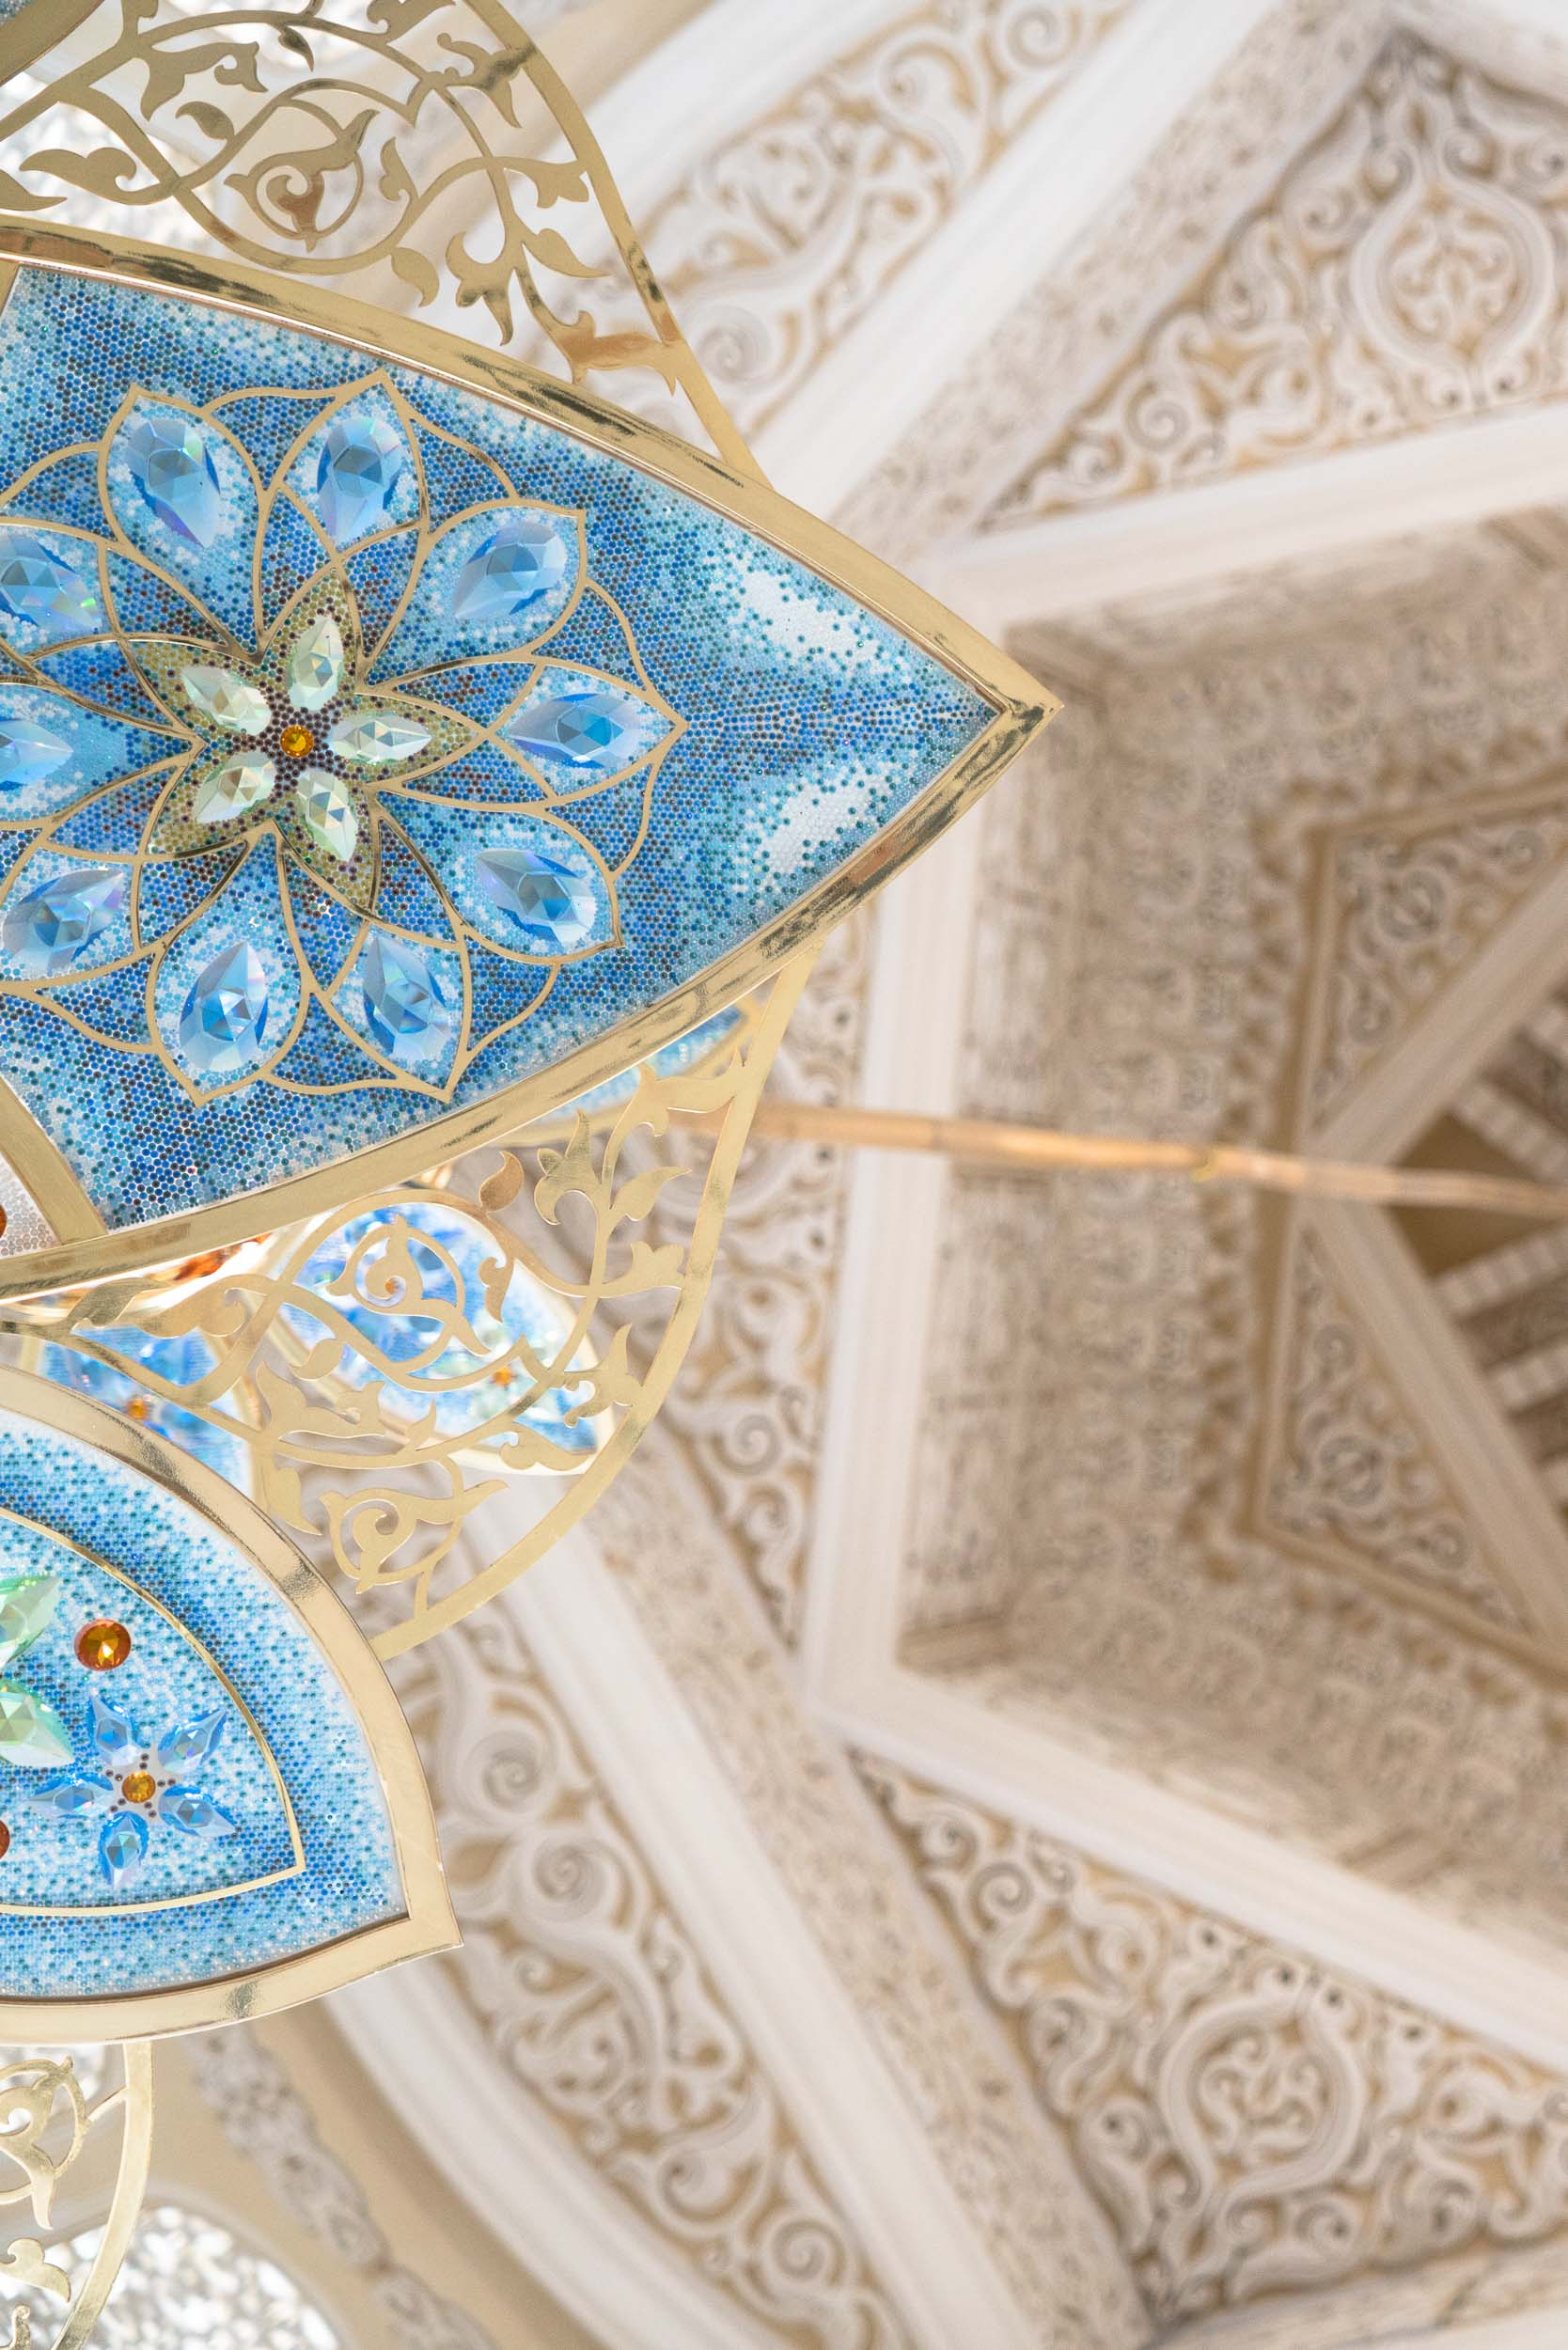 the_getaway_edit_abu_dhabi_sheikh_zayed_grand_mosque-10.jpg